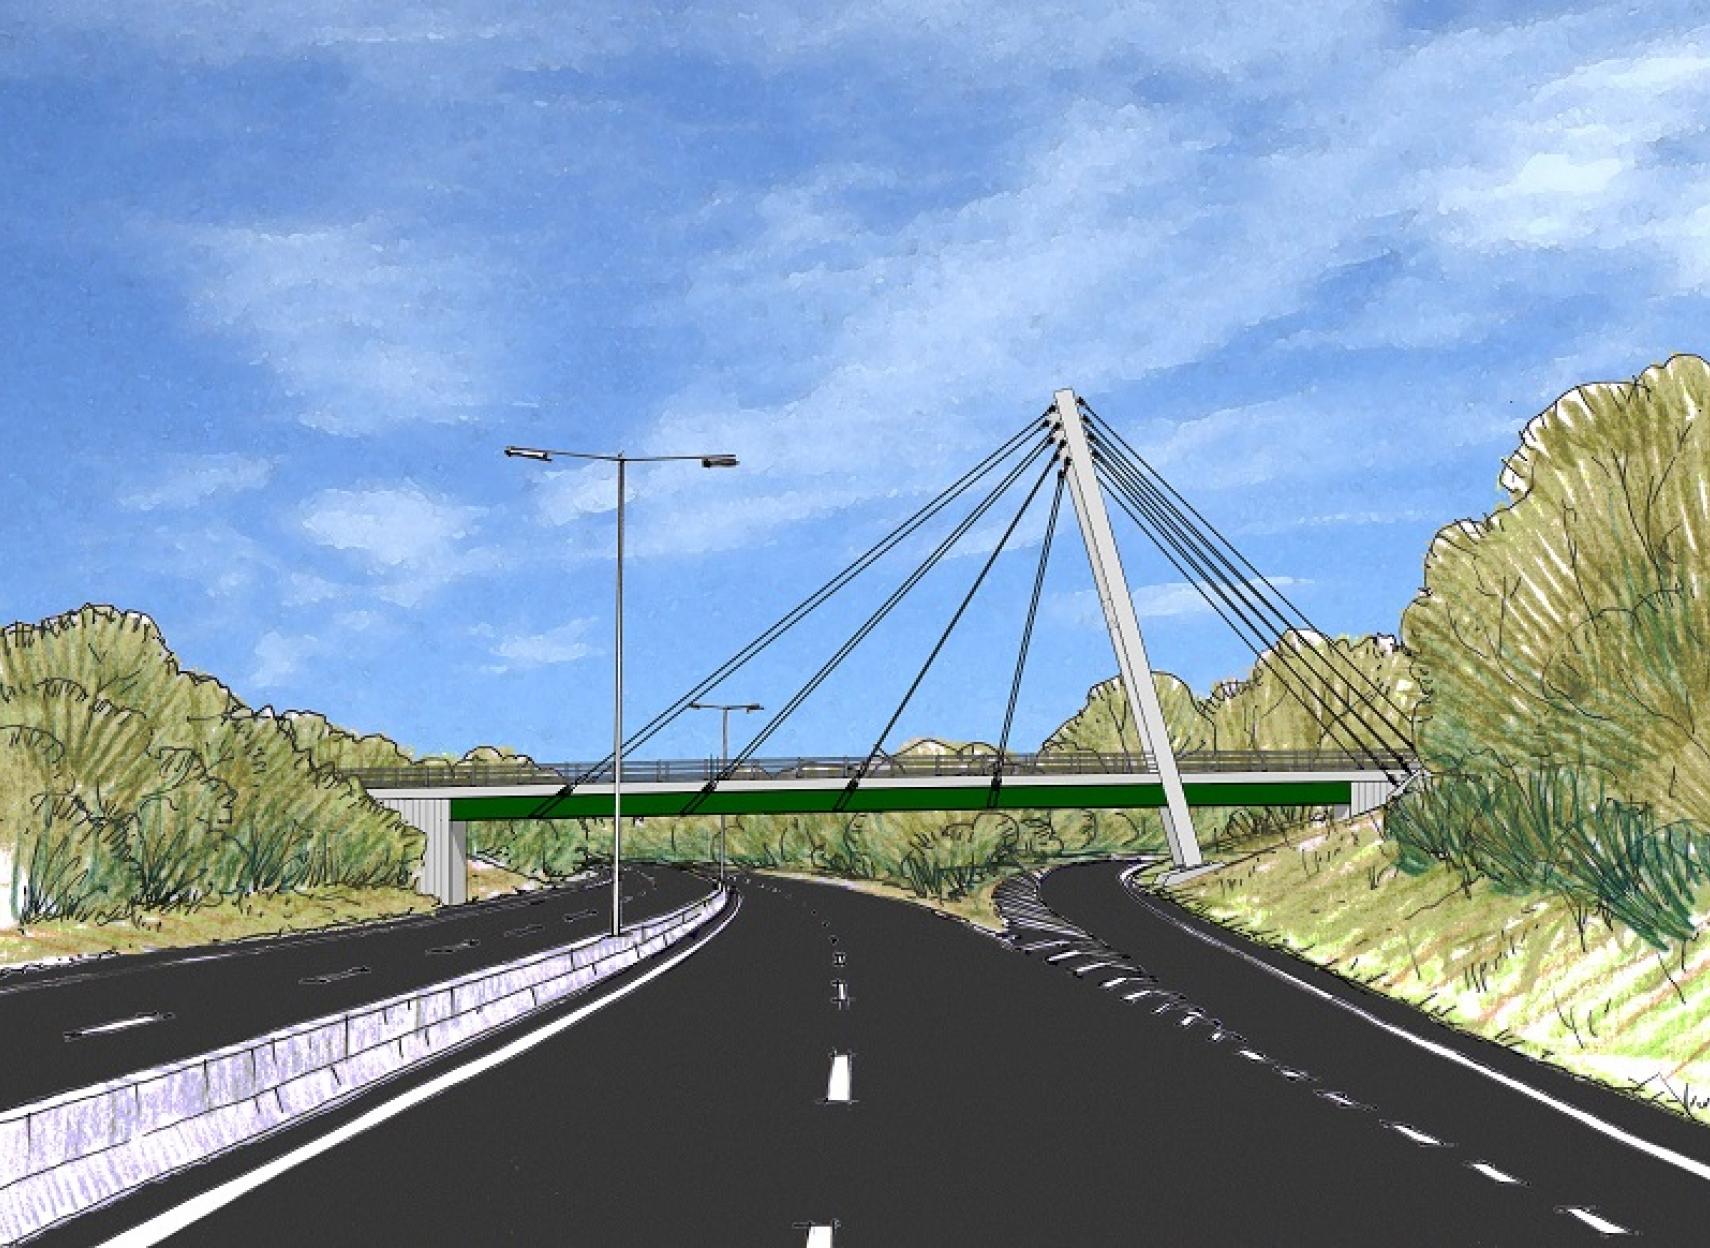 Concept art of overbridge on dual carriageway